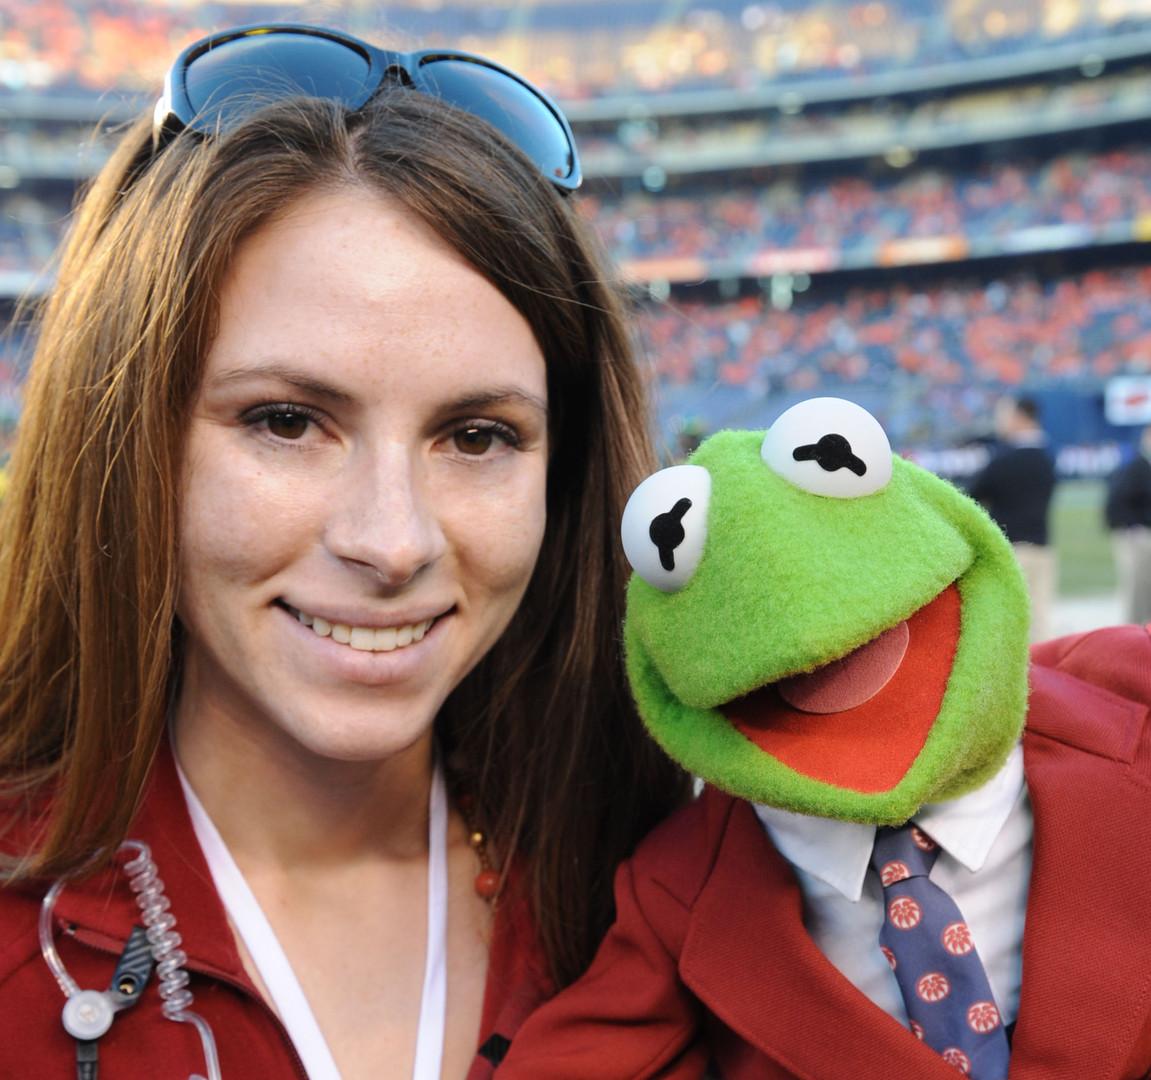 Meeting Kermit the Frog